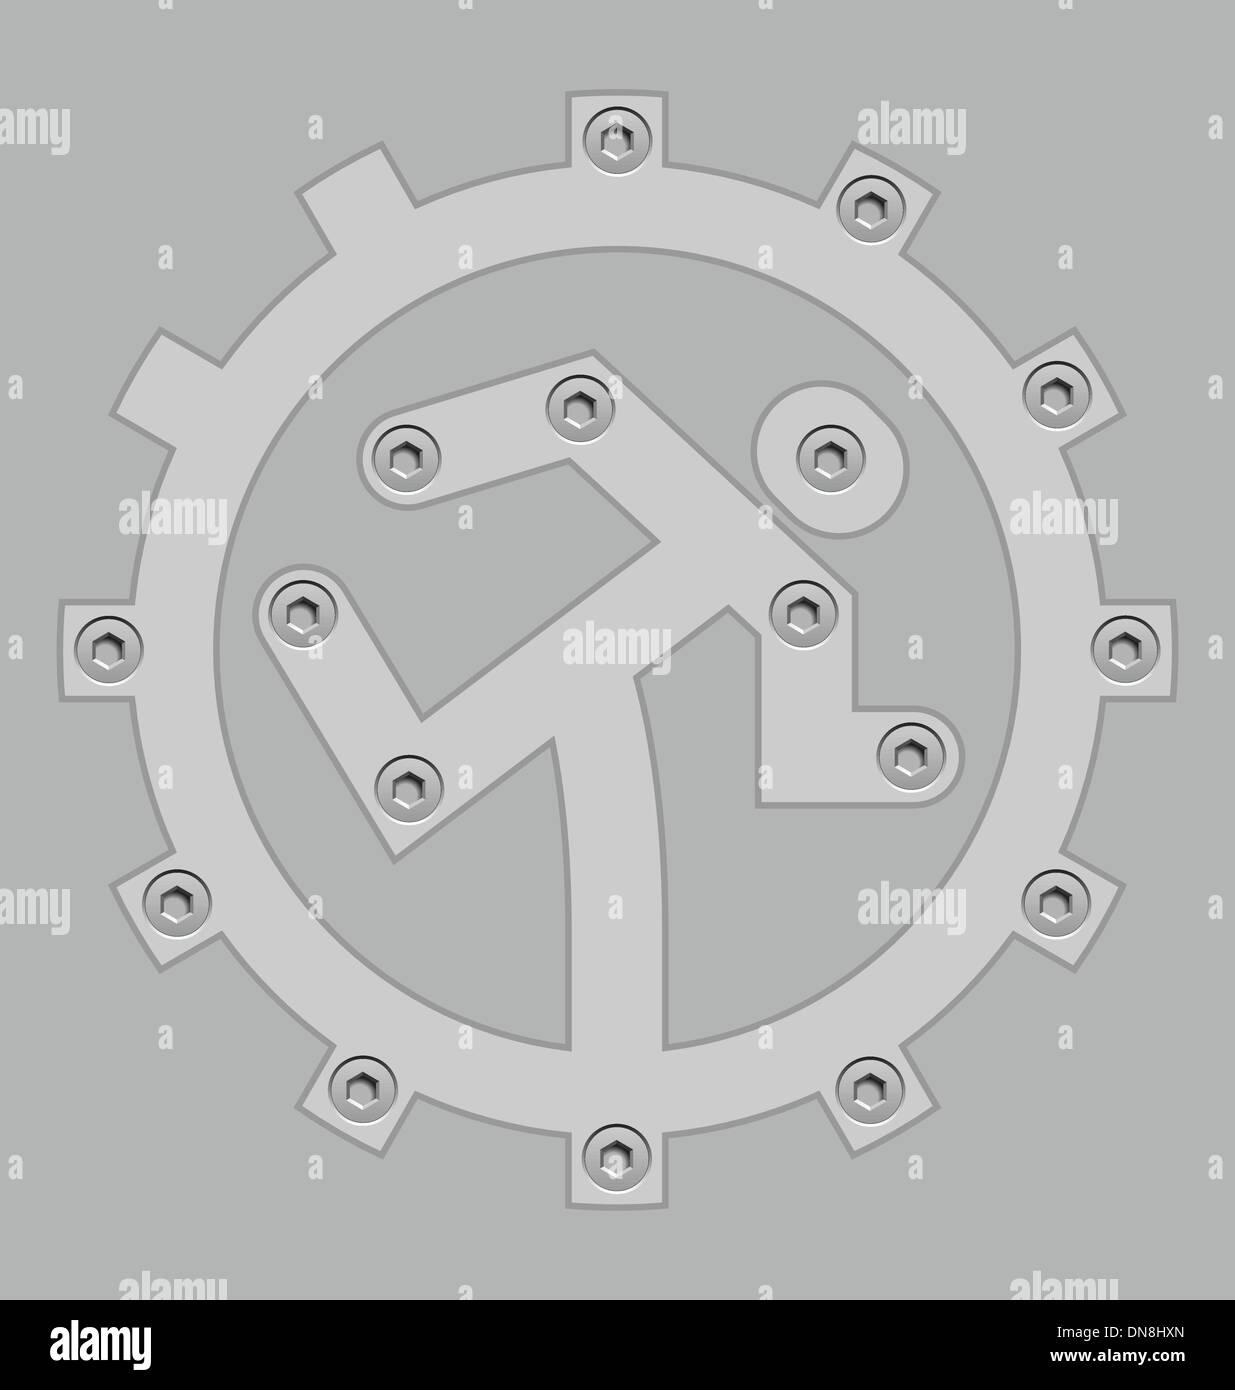 Mechanism - Stock Image